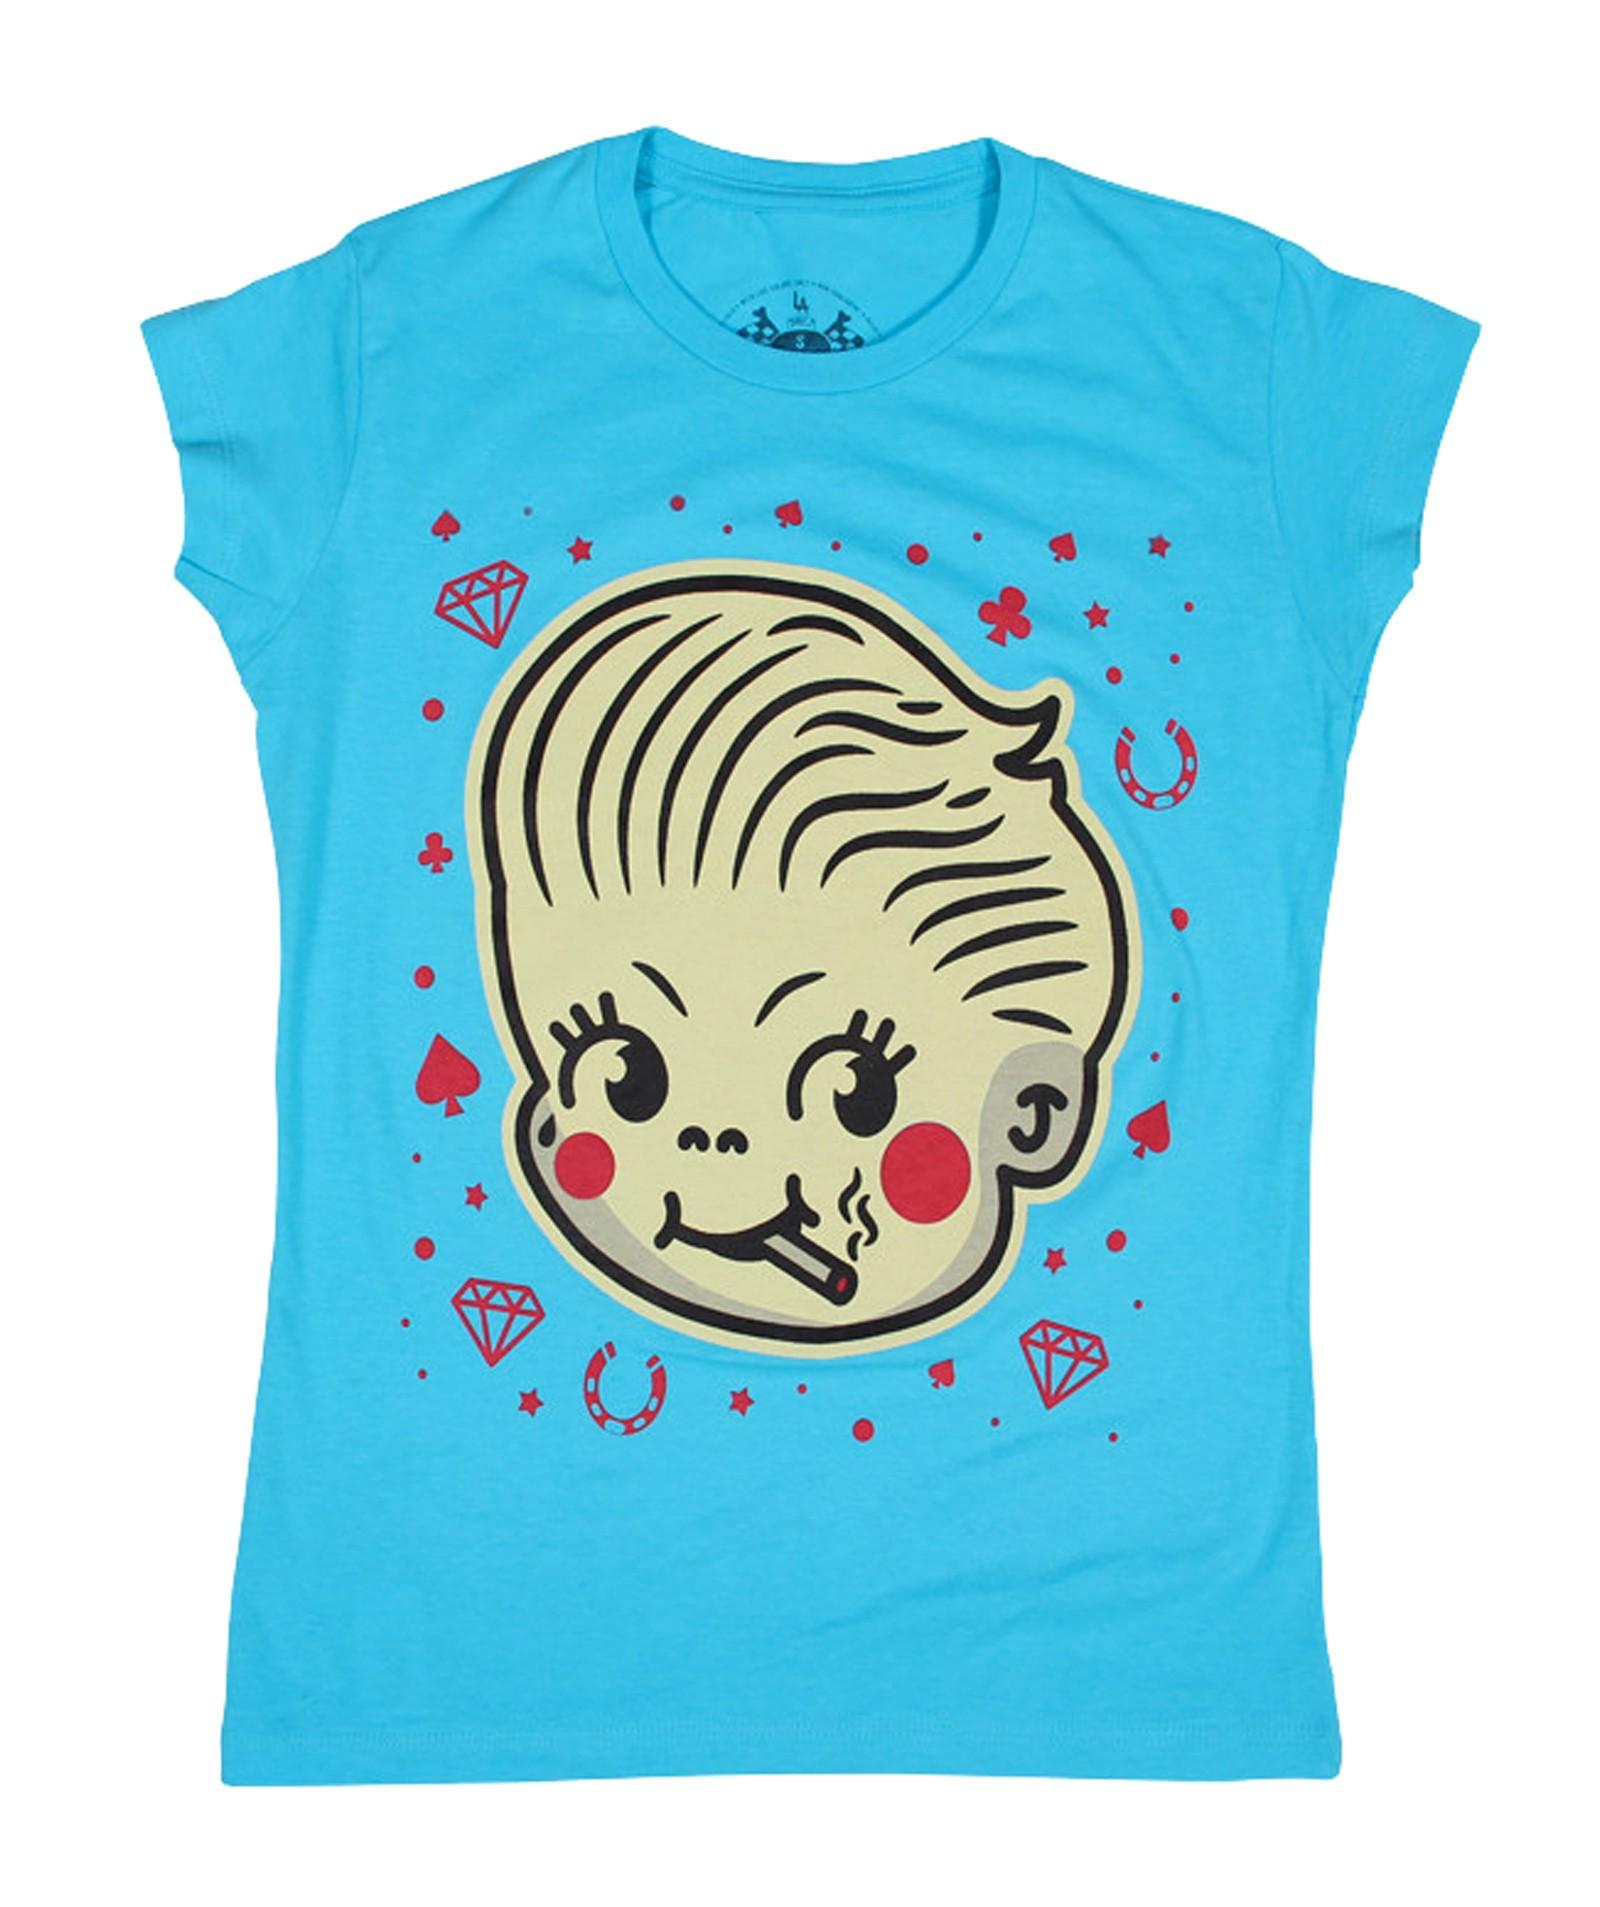 La Marca Del Diablo - The New Kewpie T-Shirt